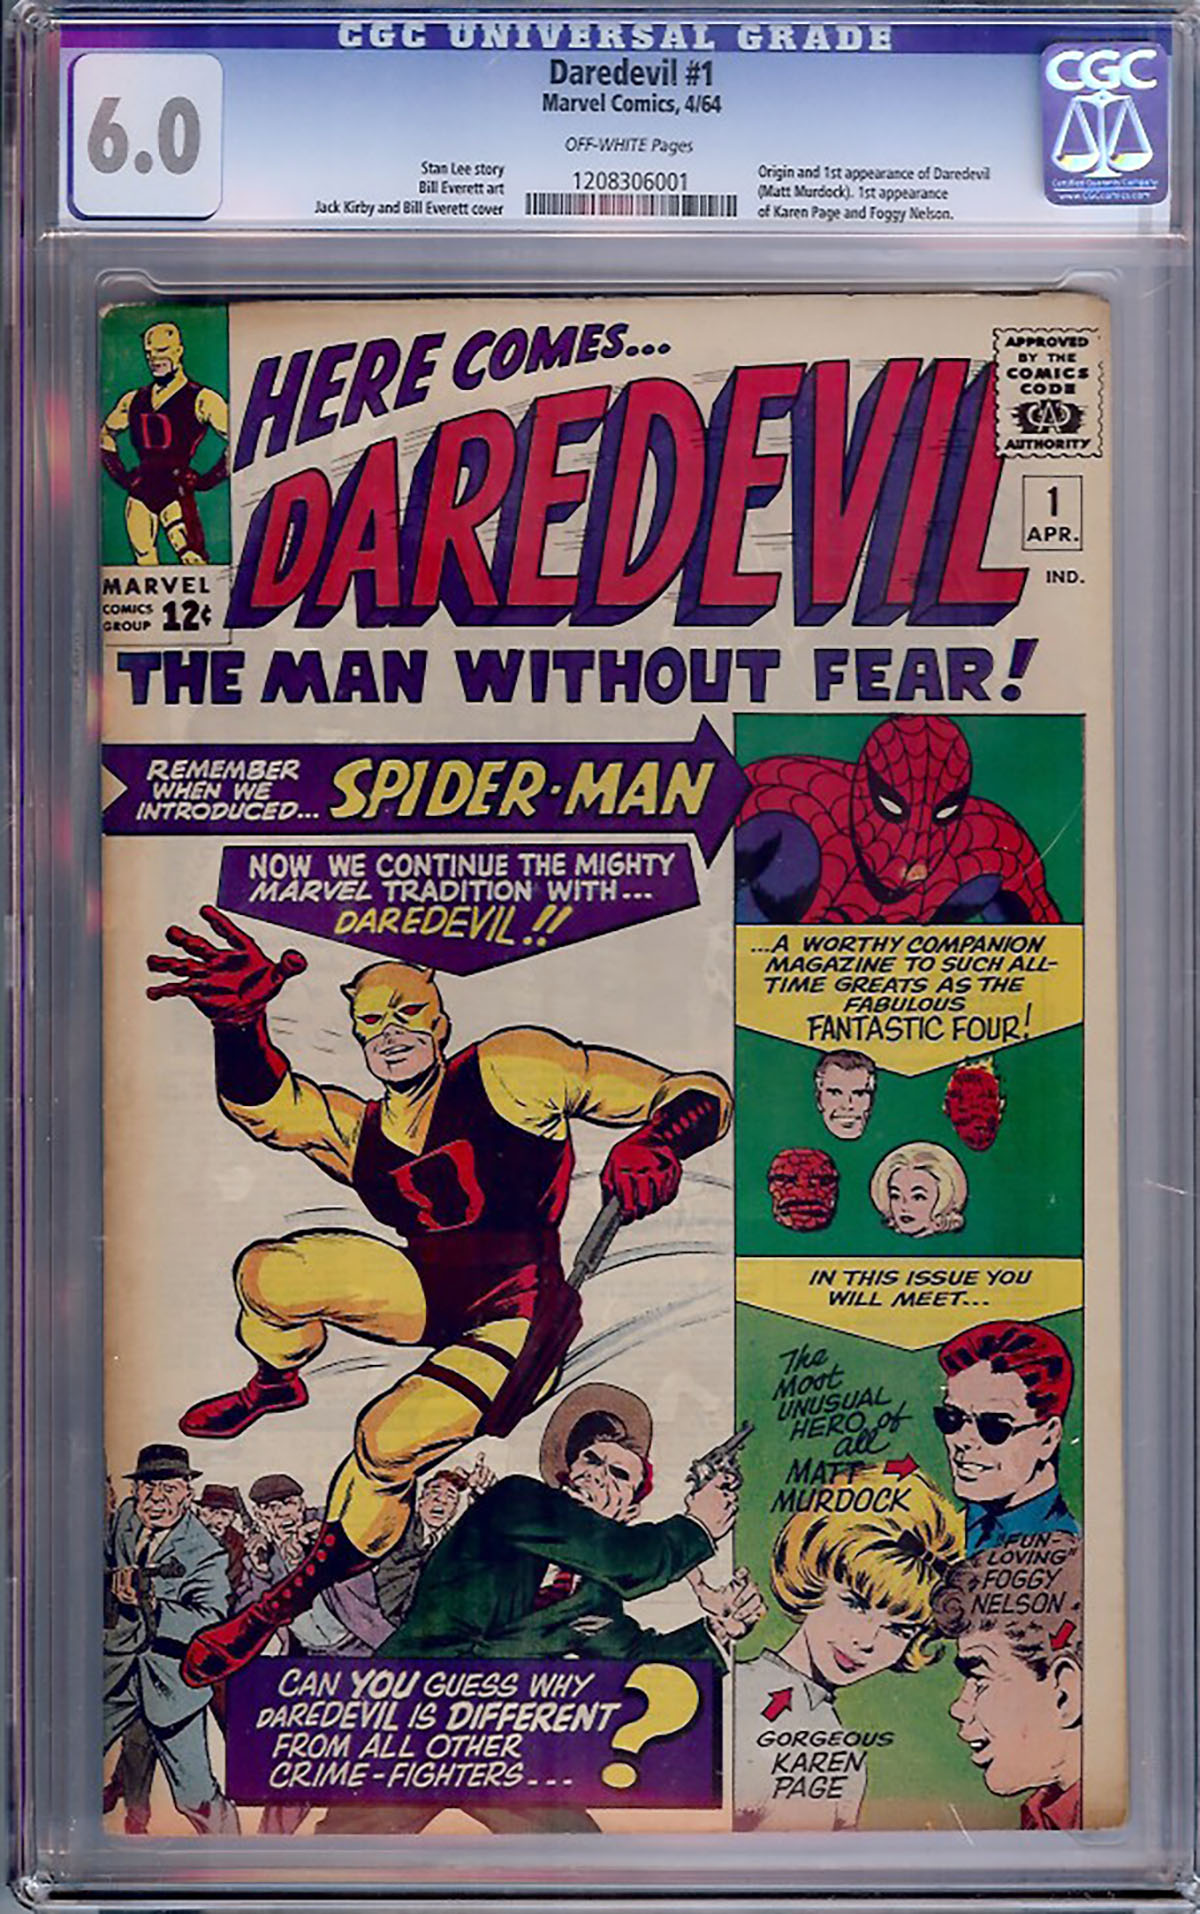 Daredevil #1 CGC 6.0 ow